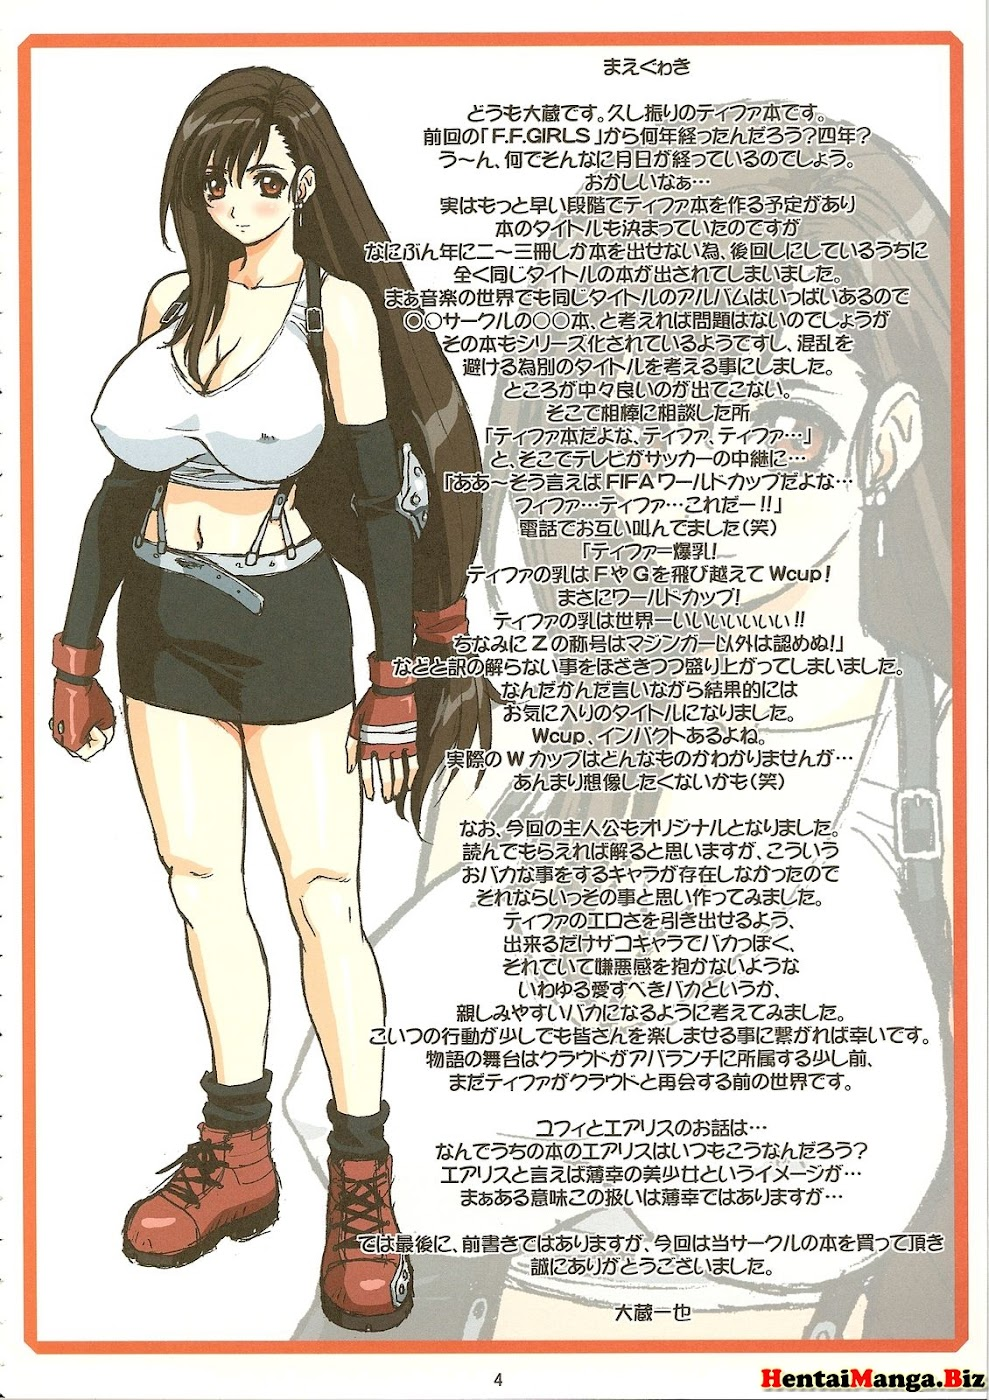 Manga lodoos xxx hentai thumbs